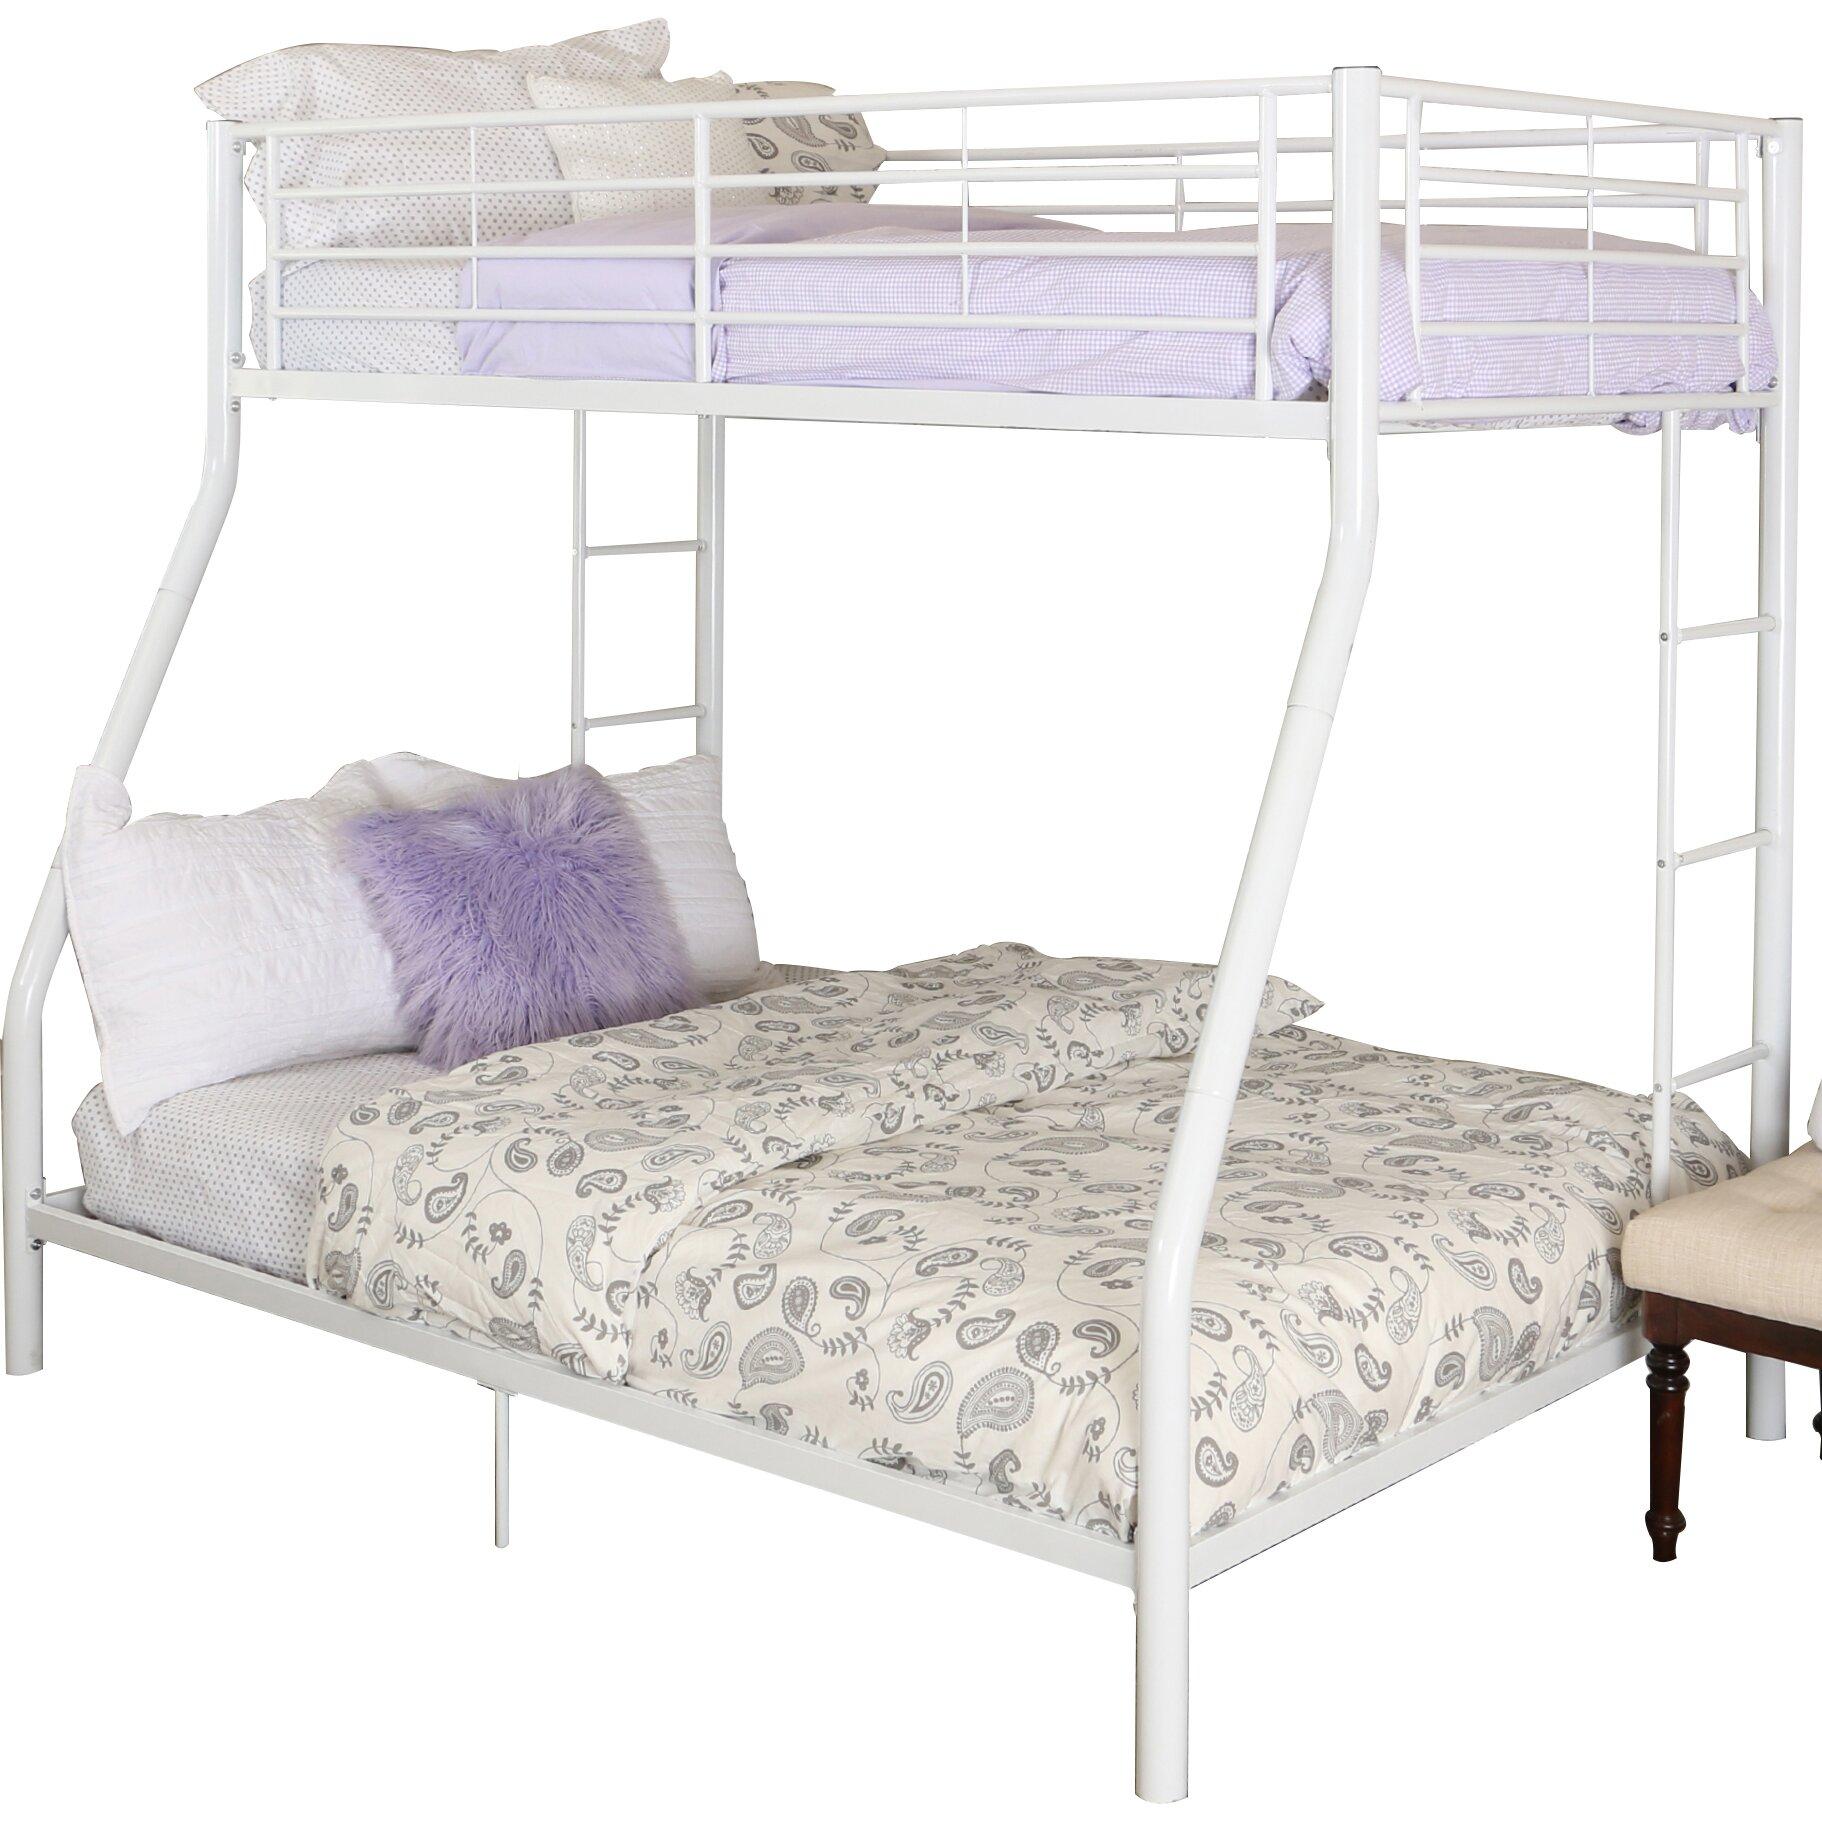 Home loft concepts sunrise twin over full bunk bed for Home loft concept bunk bed